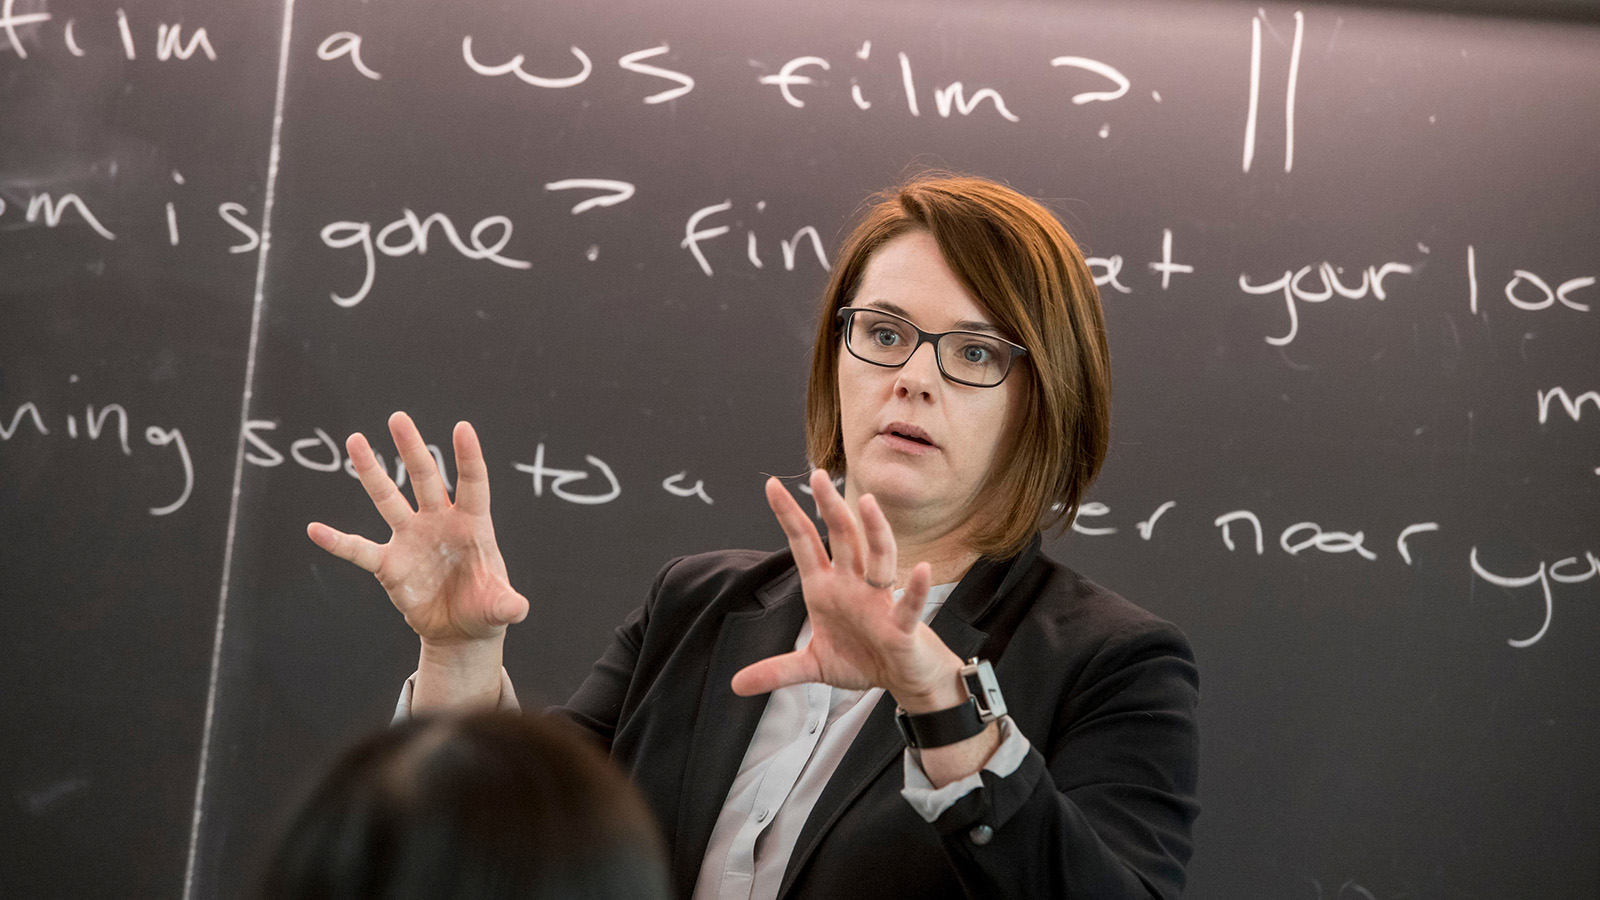 Professor gestures at front of class